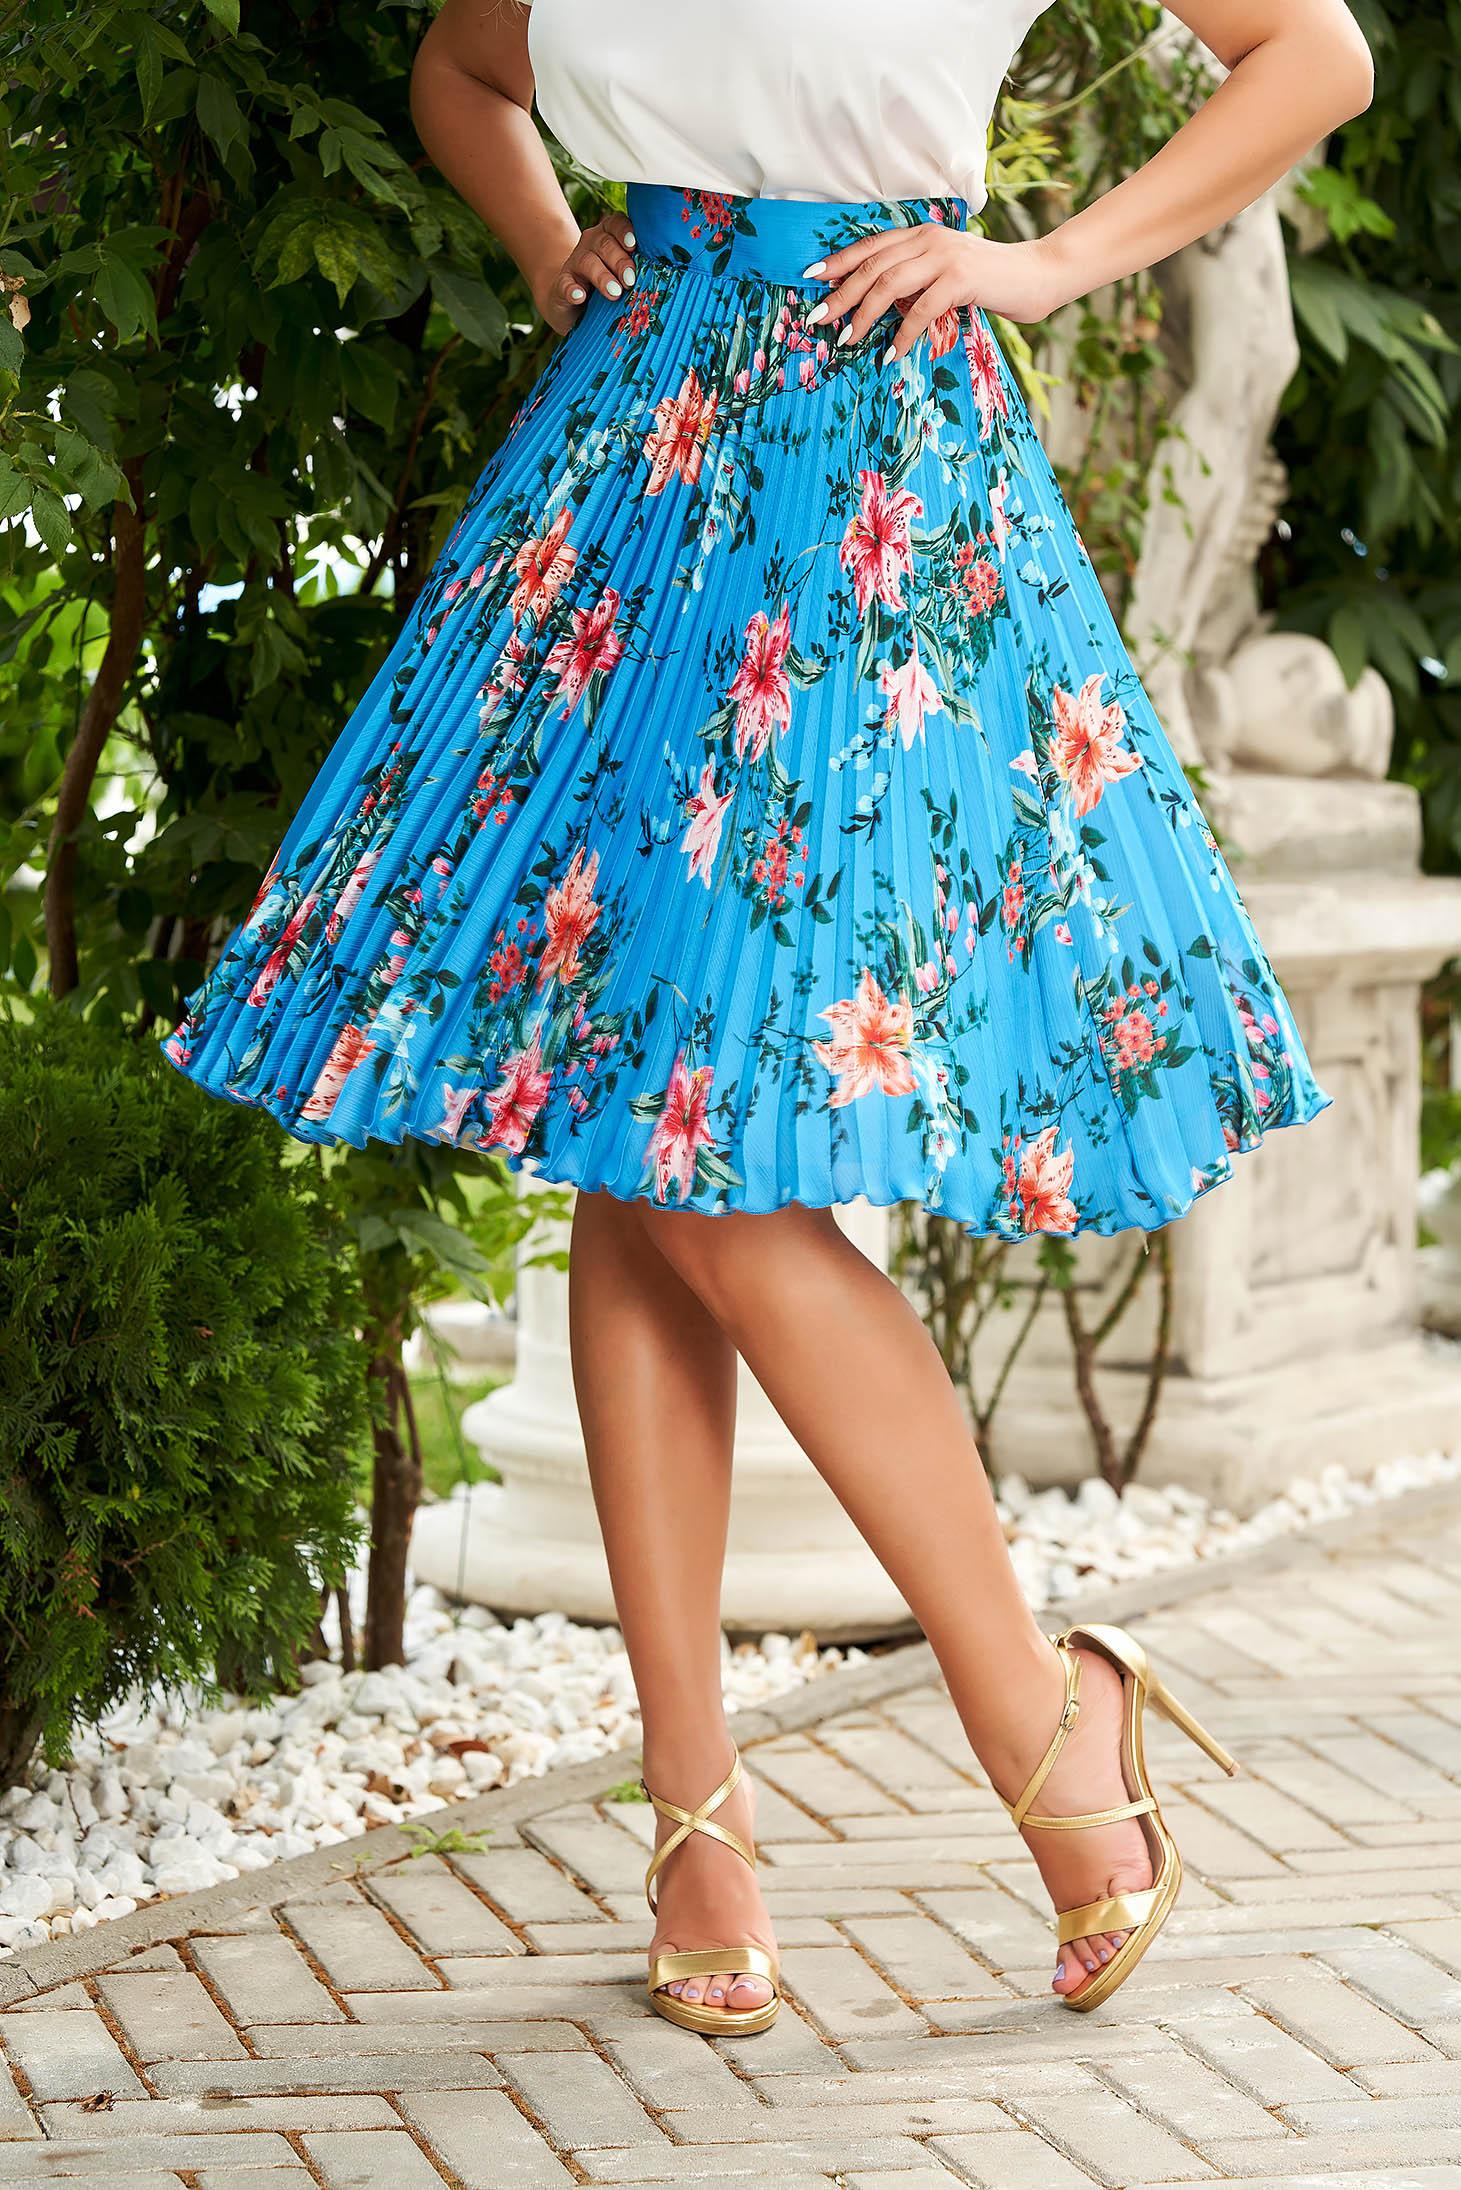 Skirt blue elegant midi flaring cut high waisted from veil fabric